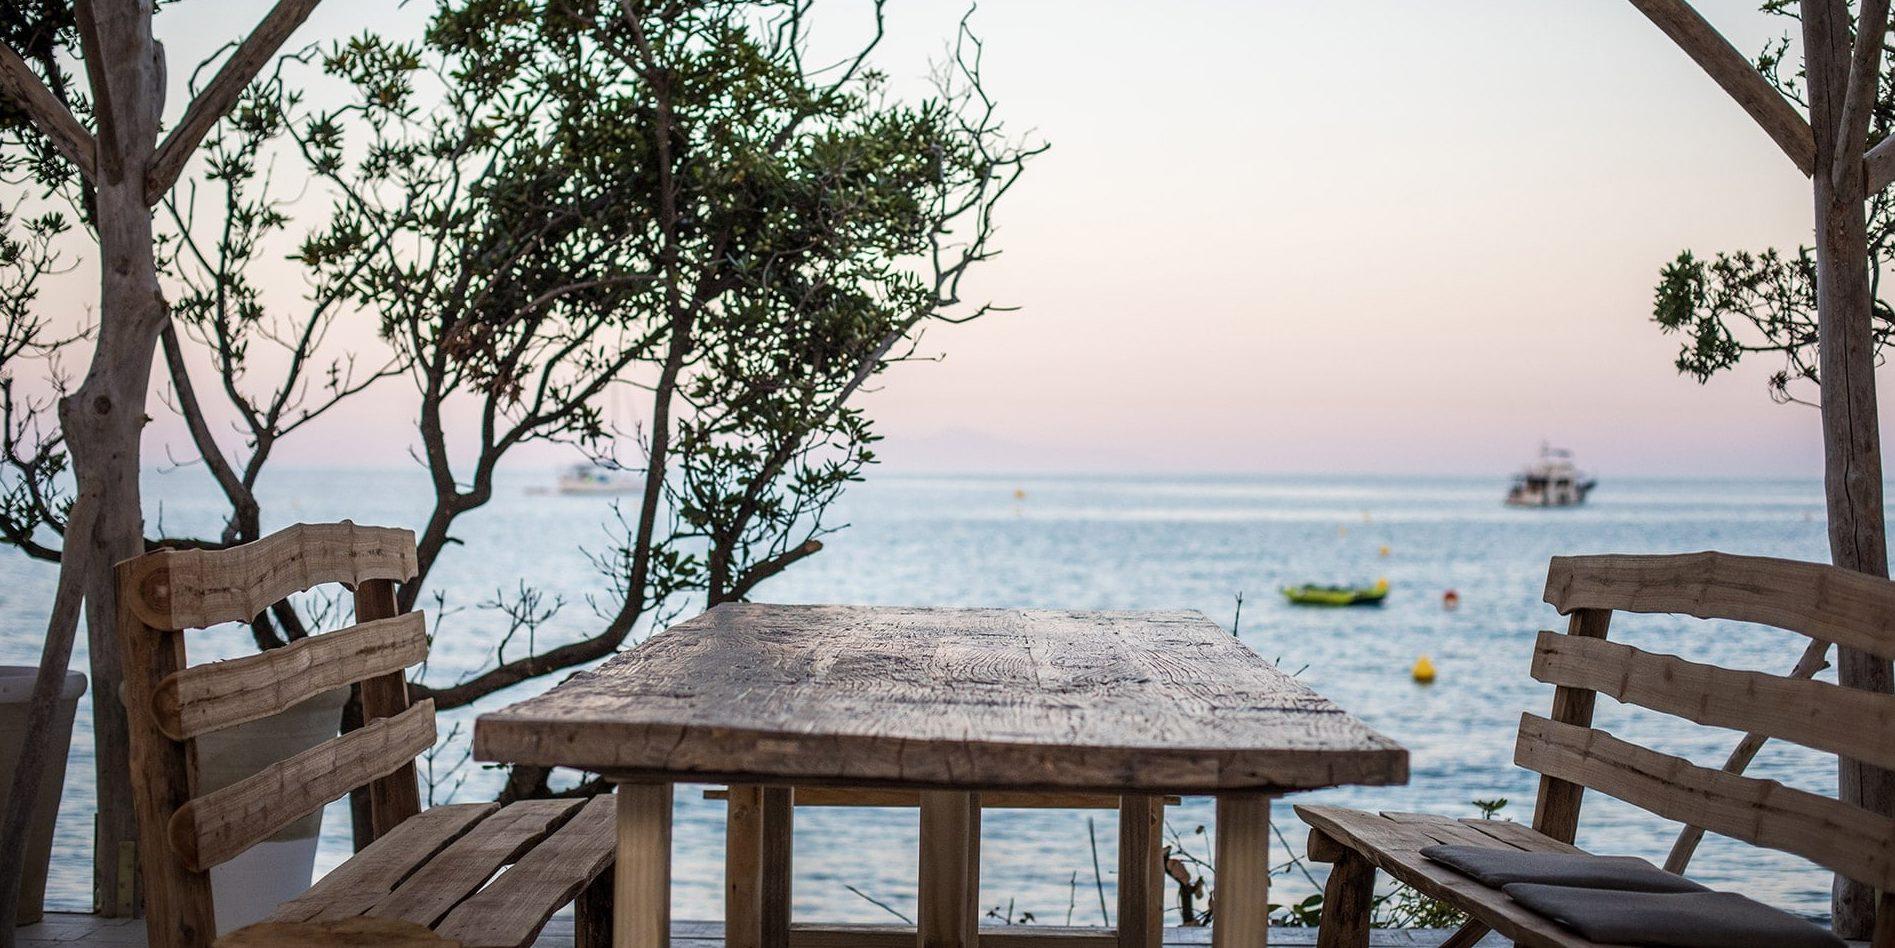 Hotel Misincu Cagnano Cap Corse Corsica Frankrijk terras aan zee boten